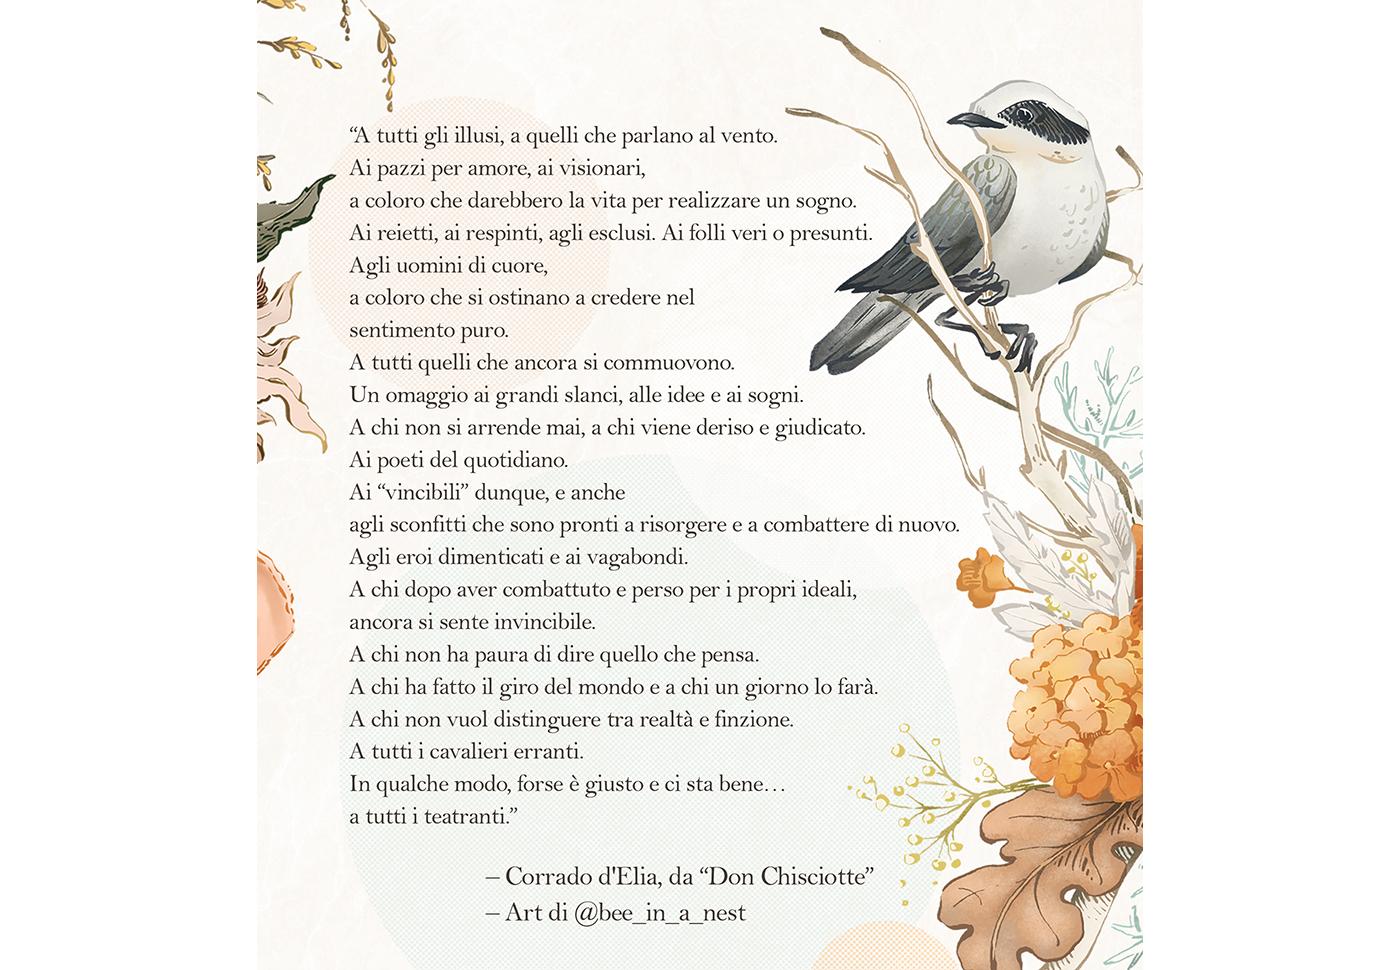 Don-Chisciotte_michela-tannoia_3.jpg